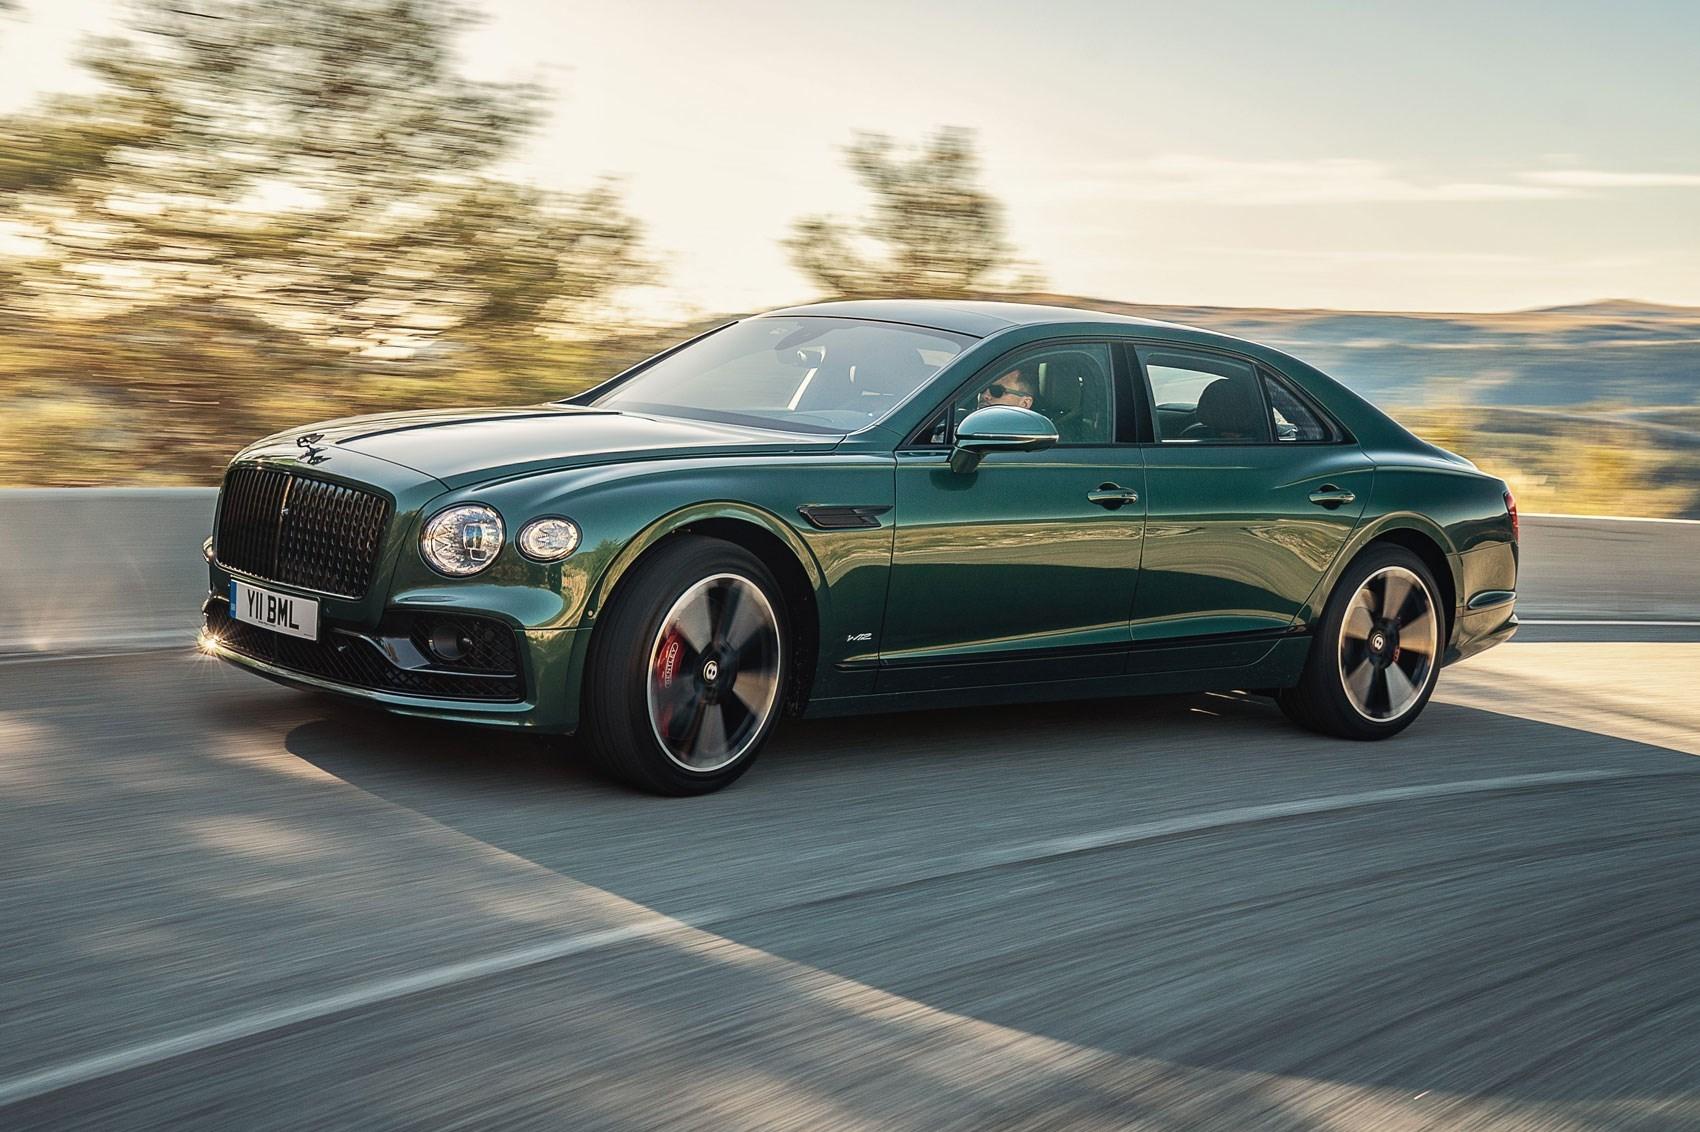 Best Luxury Cars 2019 Uk The Finest Premium Saloons On Sale Car Magazine